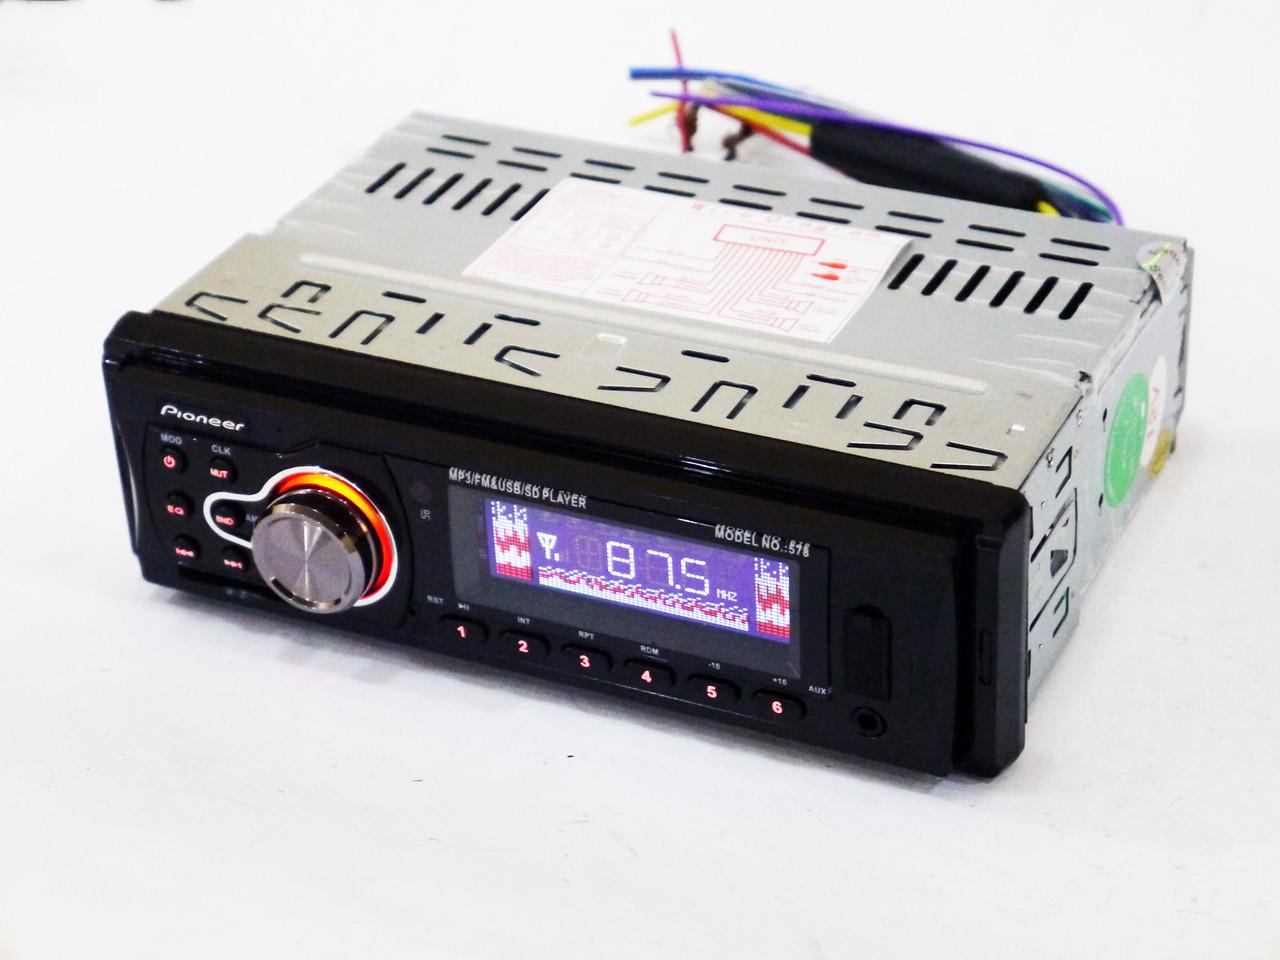 Автомагнитола Pioneer 578 - MP3 Player+FM+USB+SD+AUX